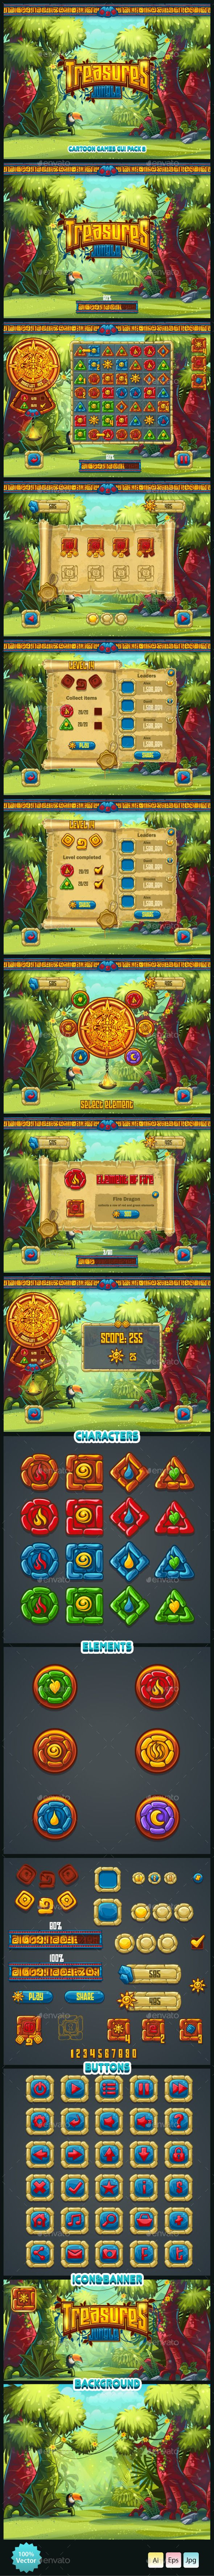 Jungle Treasures GUI. (User Interfaces)